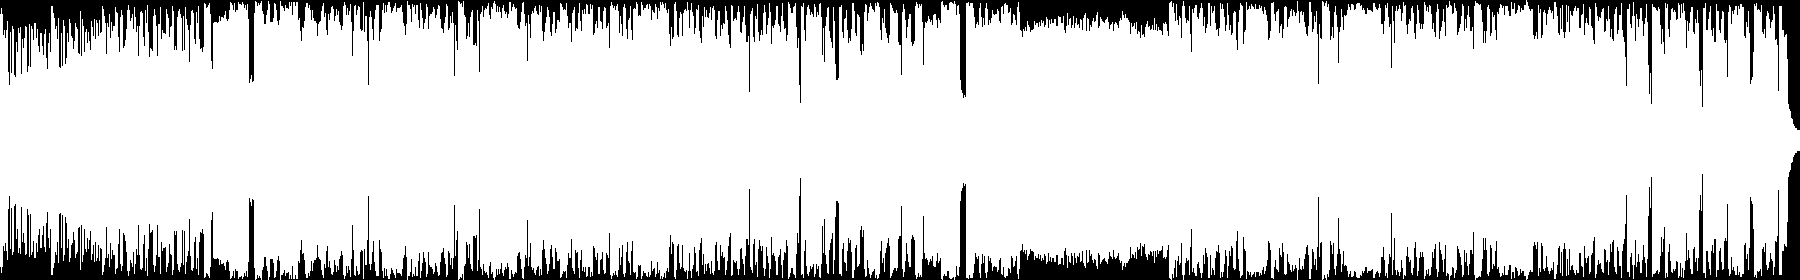 Orgasmic Glitch Hop by Tantric Decks audio waveform